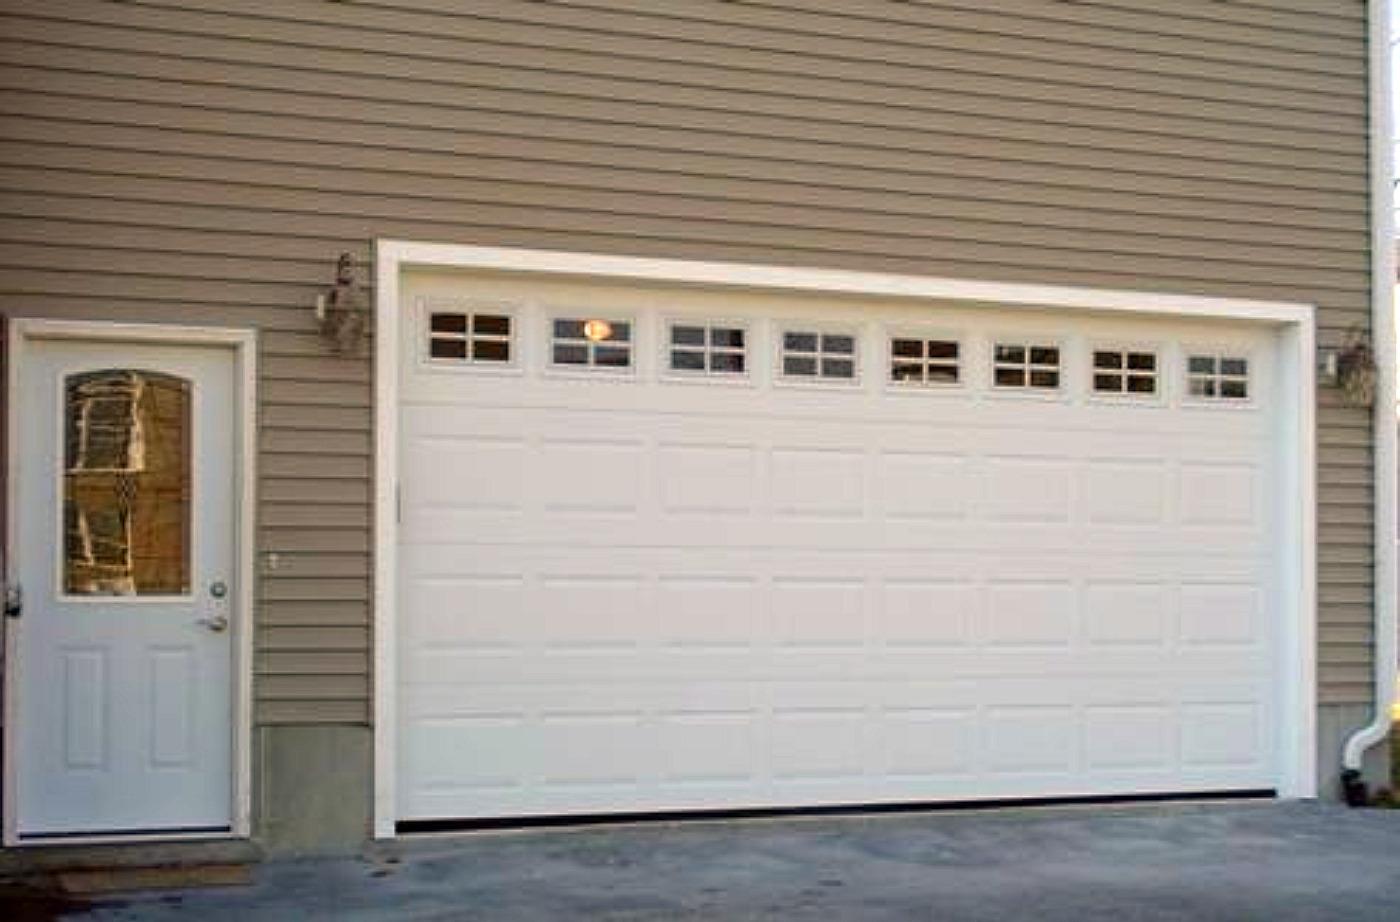 100 ideas garage door images on mailocphotos garage doors philadelphia llc in philadelphia pa 267 8007 rubansaba